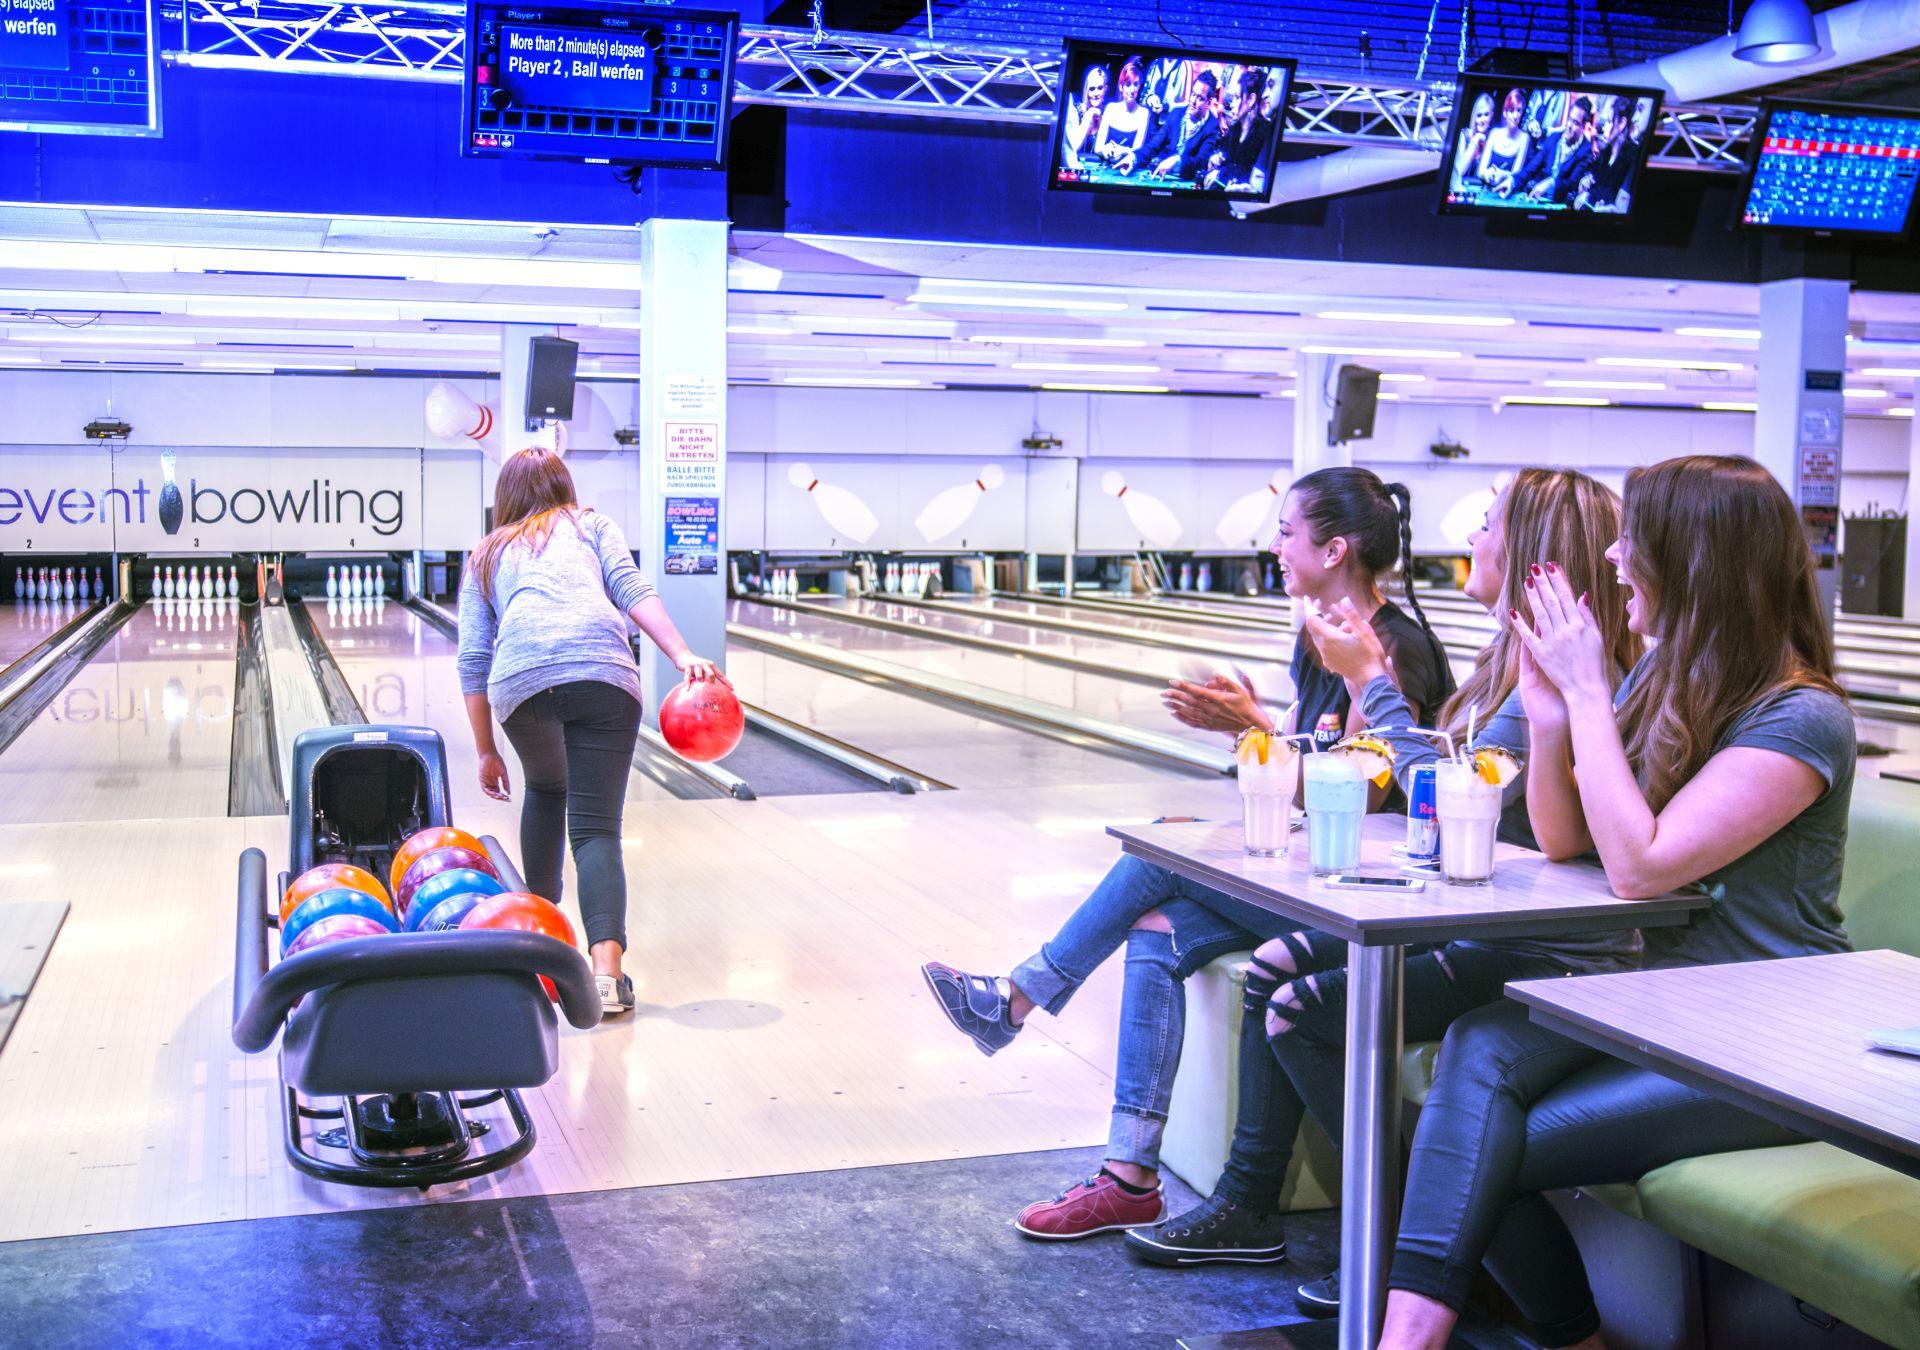 bowling deals event bowling in aachen alsdorf. Black Bedroom Furniture Sets. Home Design Ideas